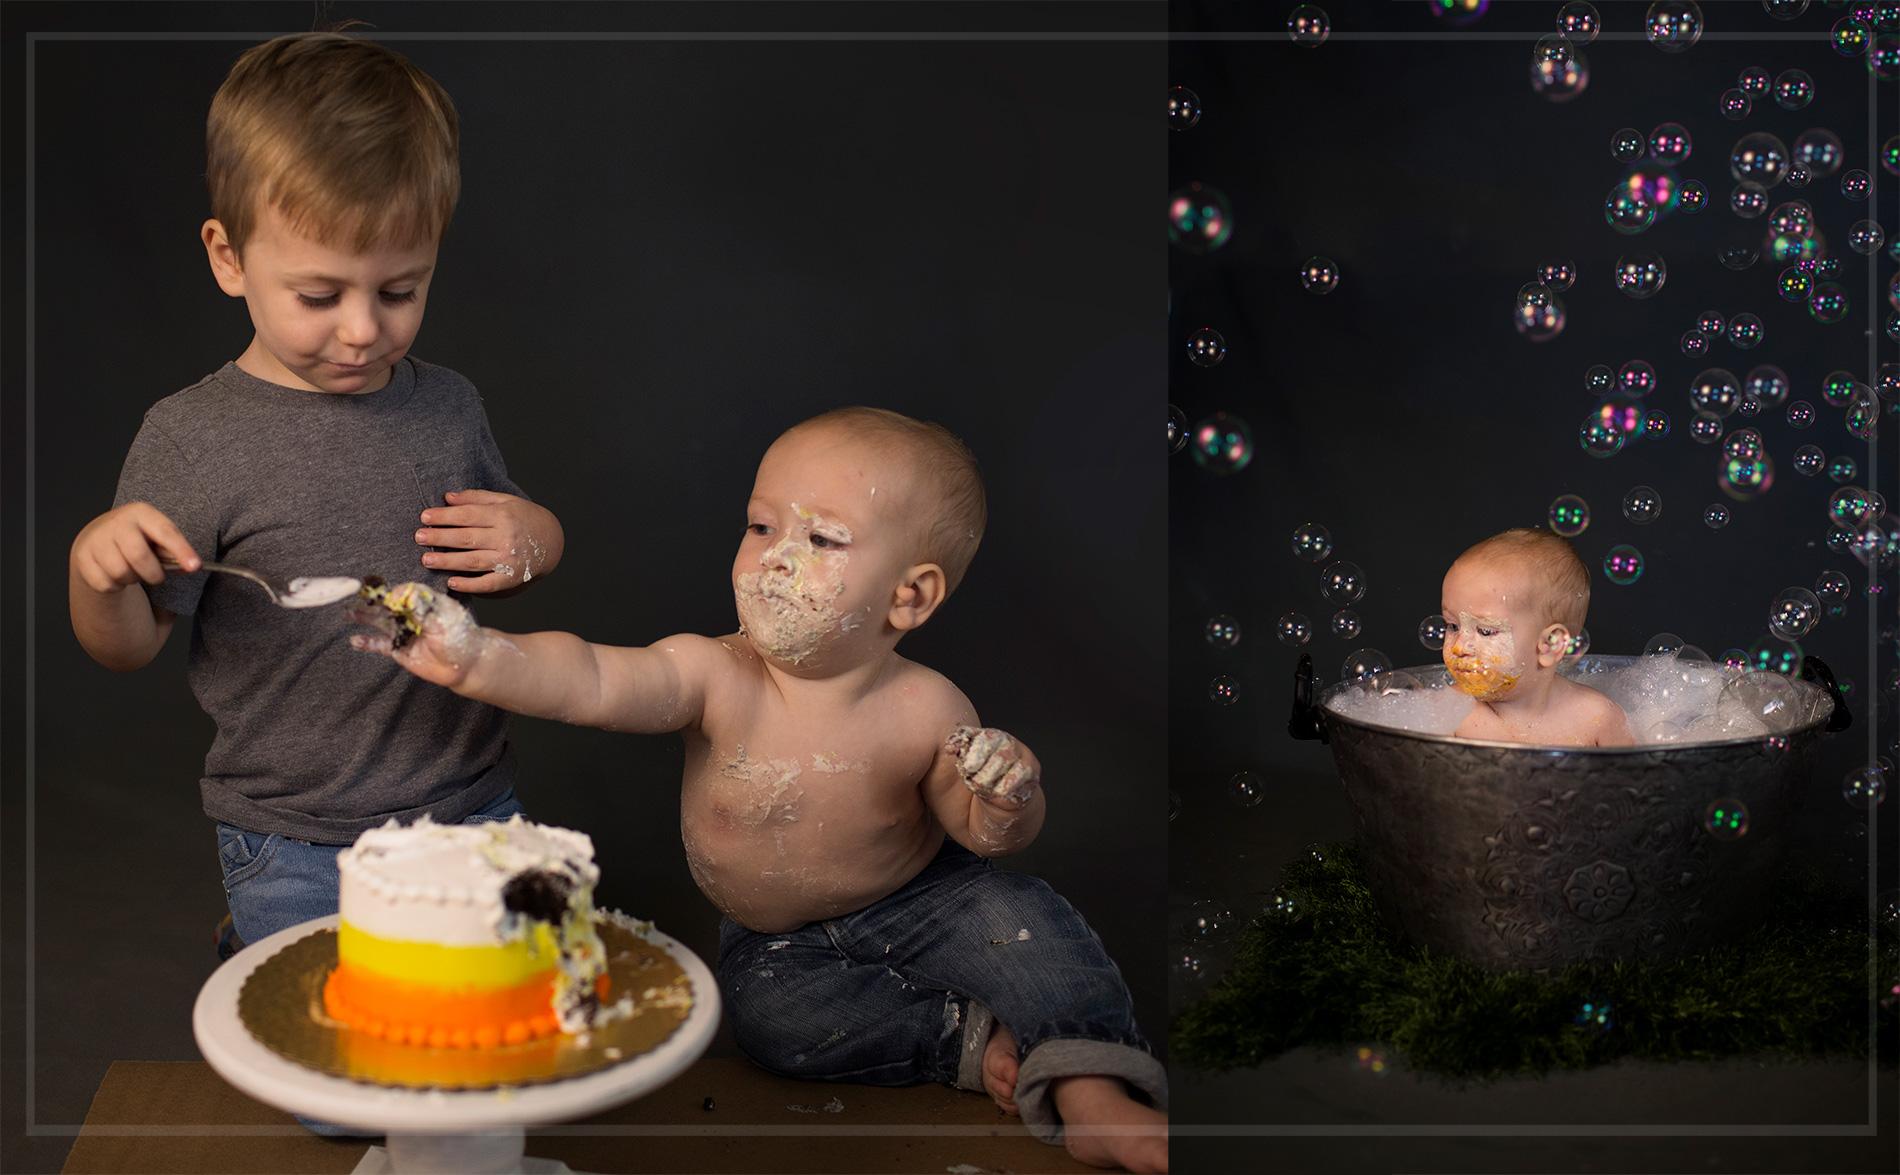 rogers-northwest-arkansas-bentonville-cake-smash-first-birthday-session-sunny-skaggs-photography.jpg